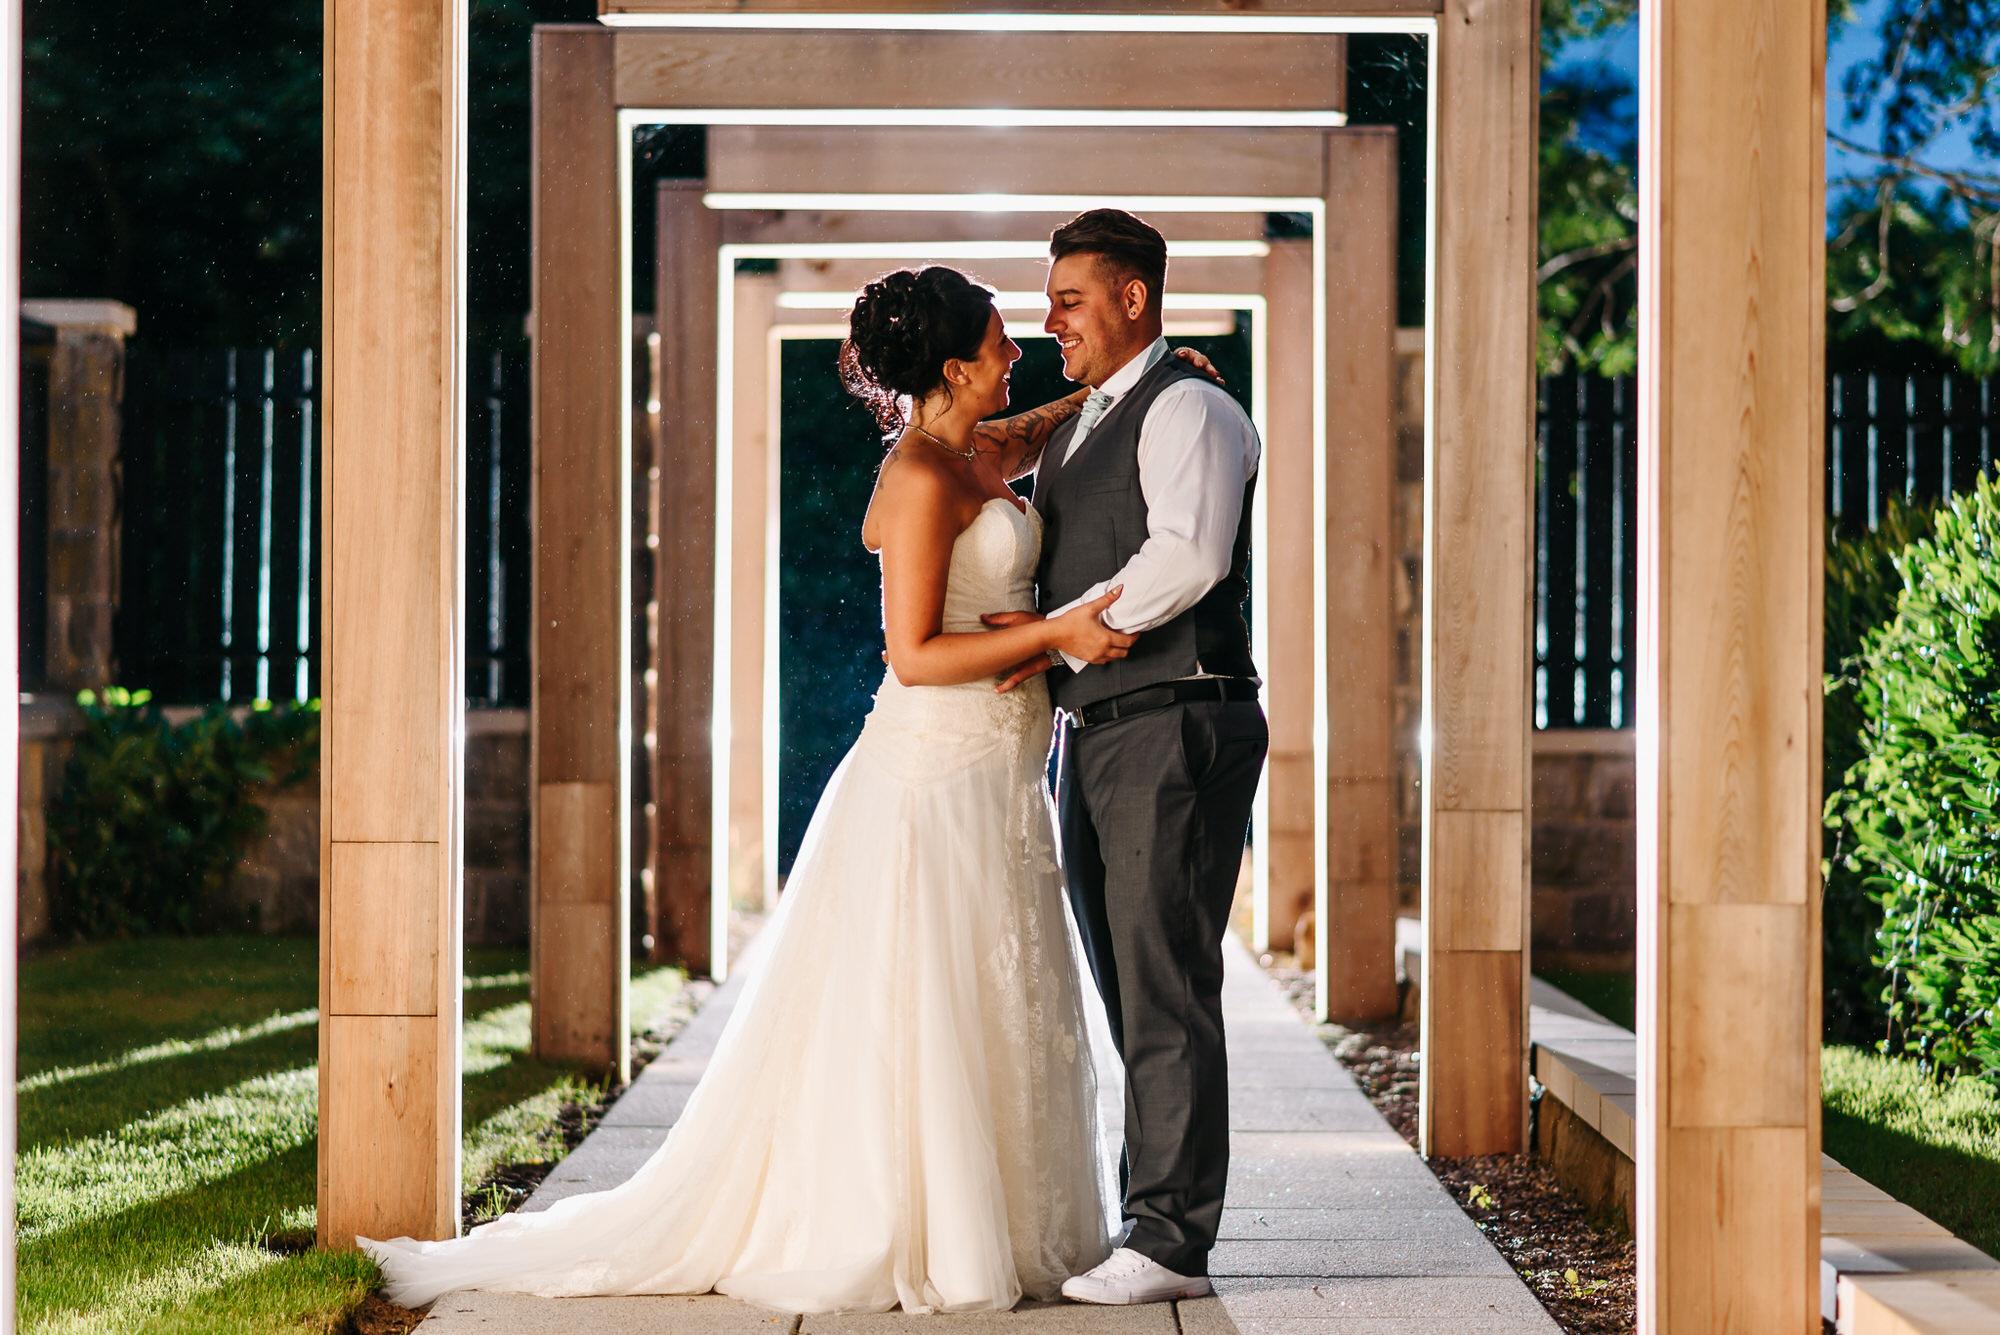 Best Of Yorkshire Wedding Photography 2017 - Martyn Hand-44.jpg